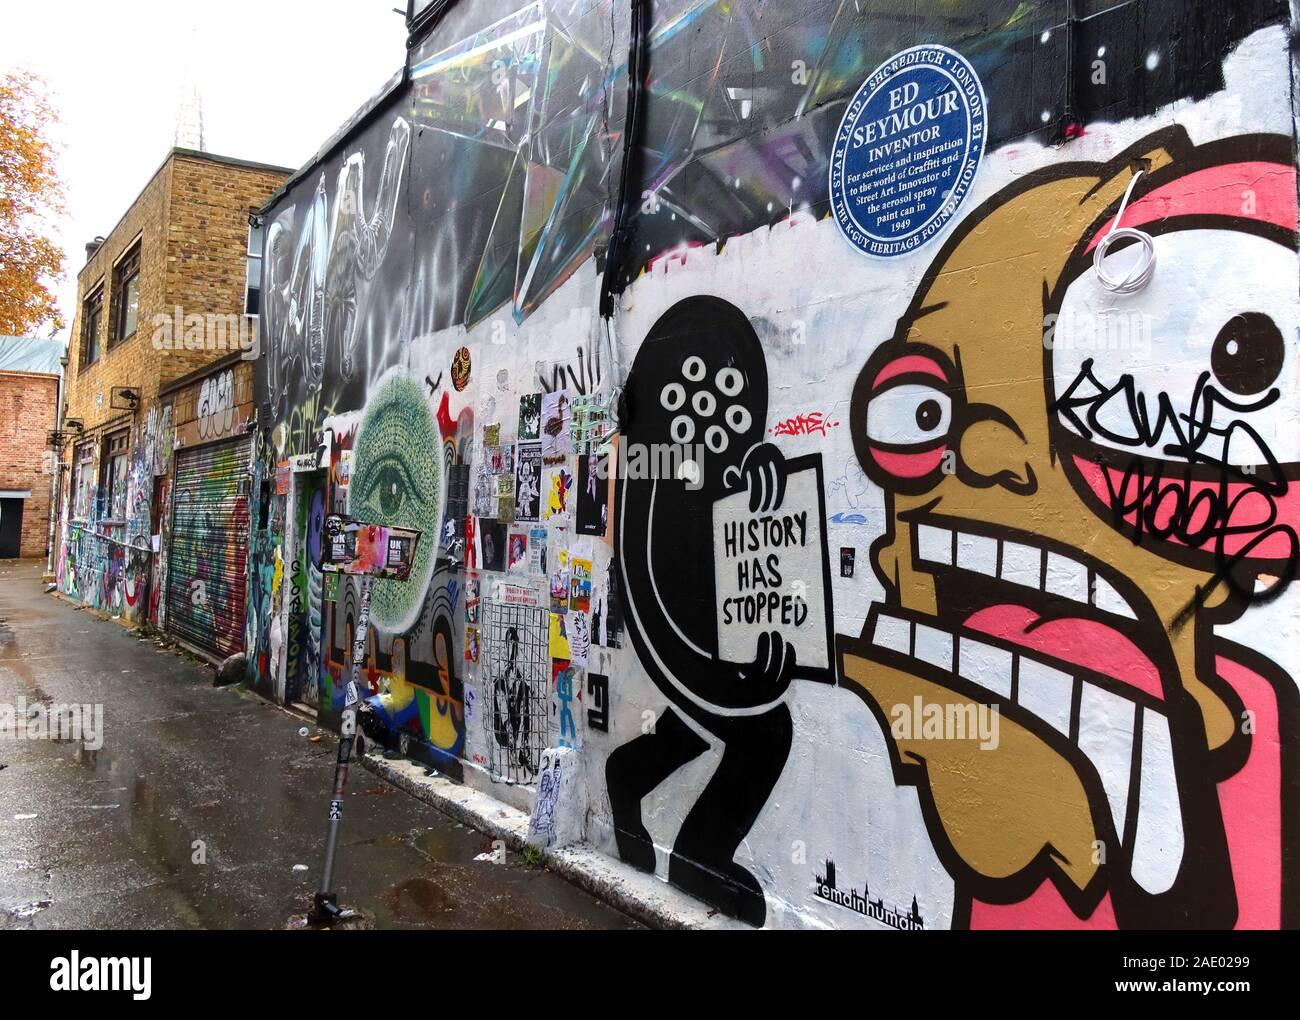 Dieses Stockfoto: Geschichte hat aufgehört,Ed Seymour,Brick Lane,Kunst und Graffiti,Shoreditch,Tower Hamlets,East End,London,South East,England,UK, E1 6QL - 2AE029